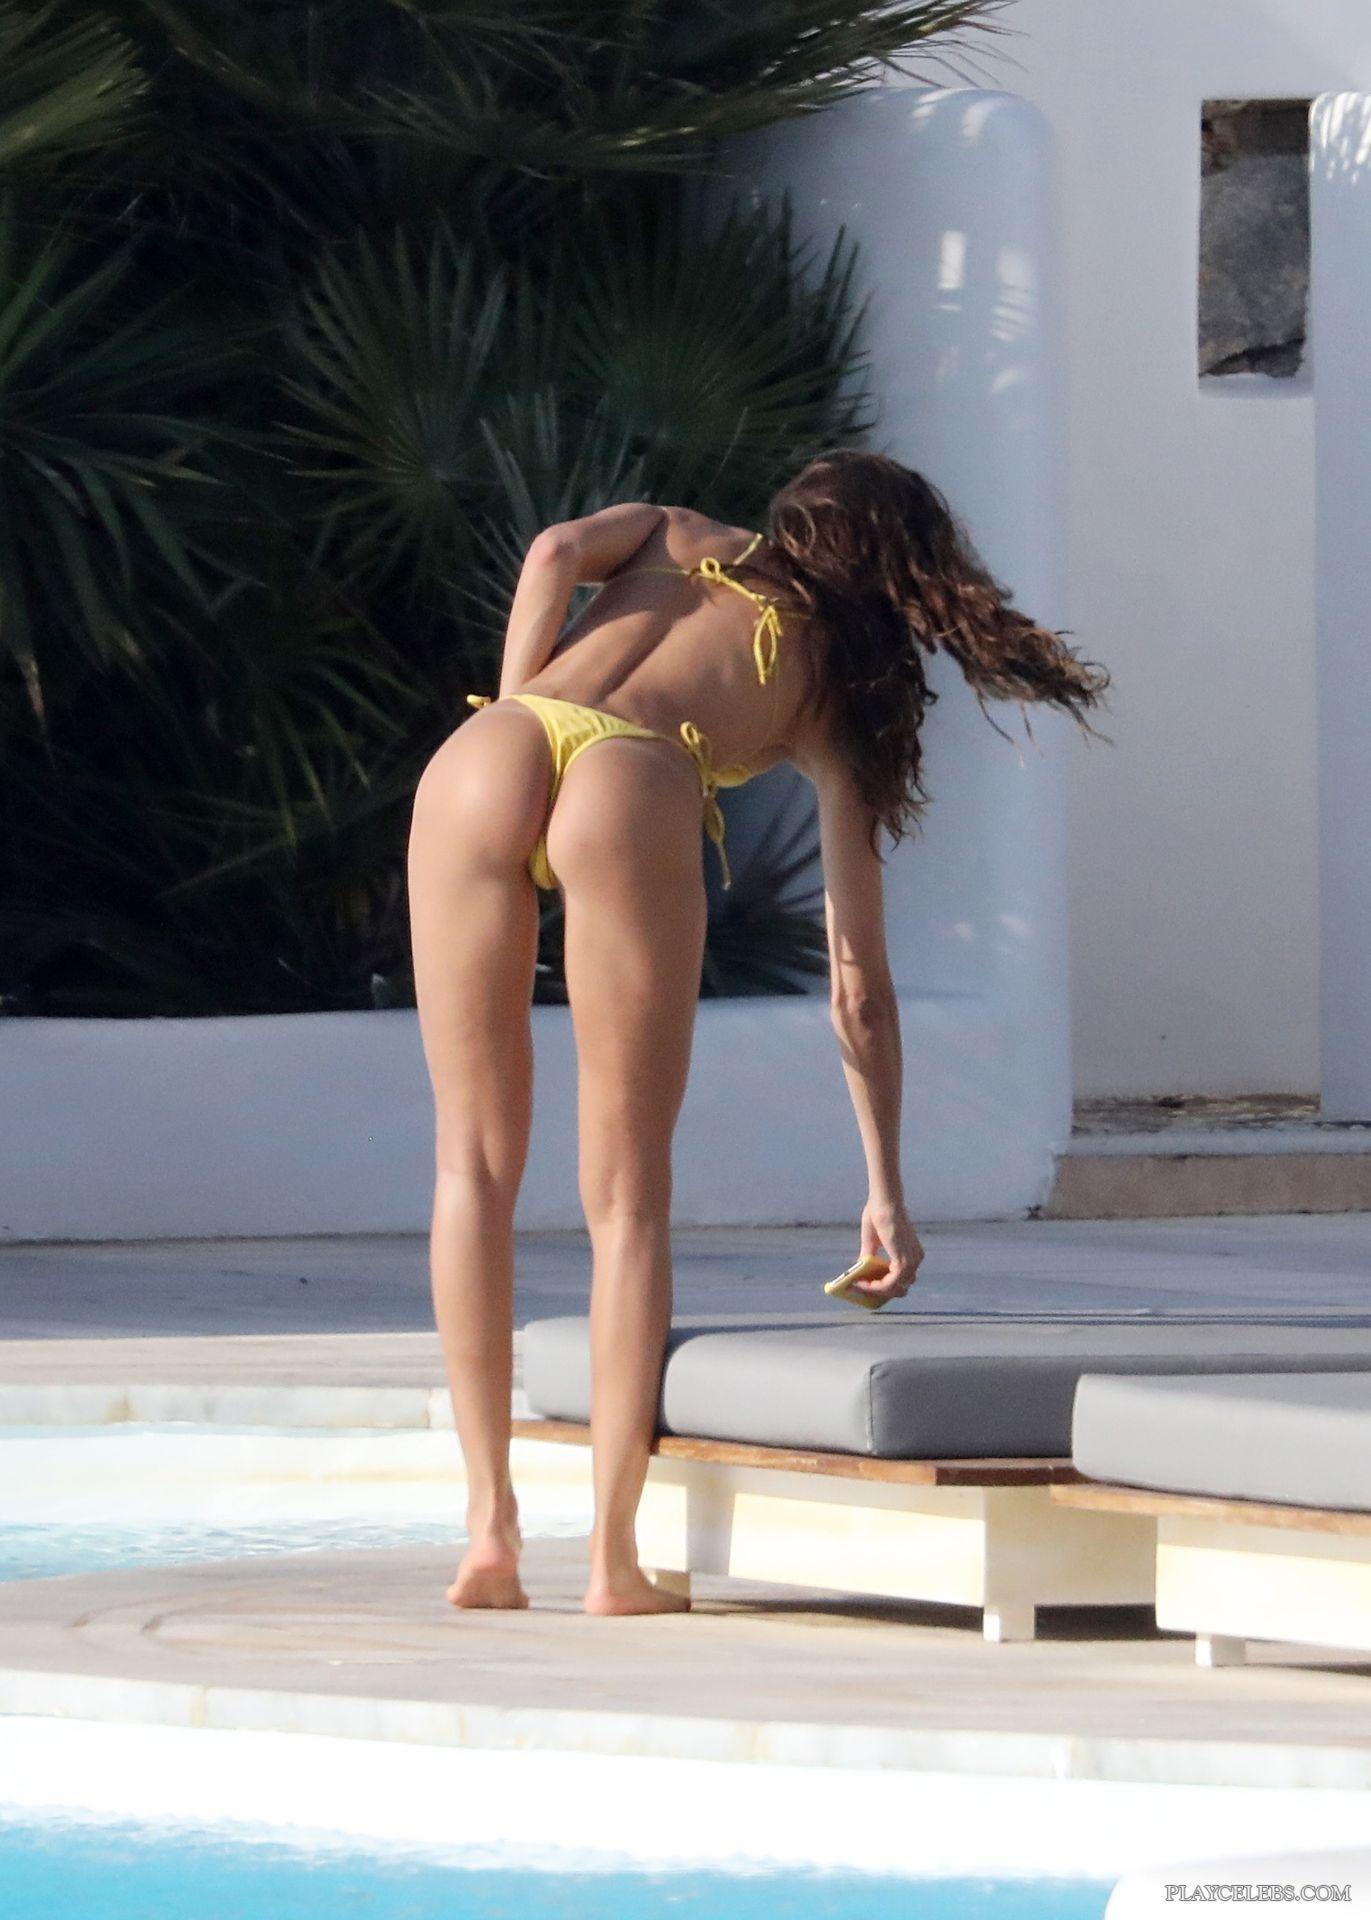 Izabel Goulart Sunbathing In Thong Bikini With Her Boyfriend